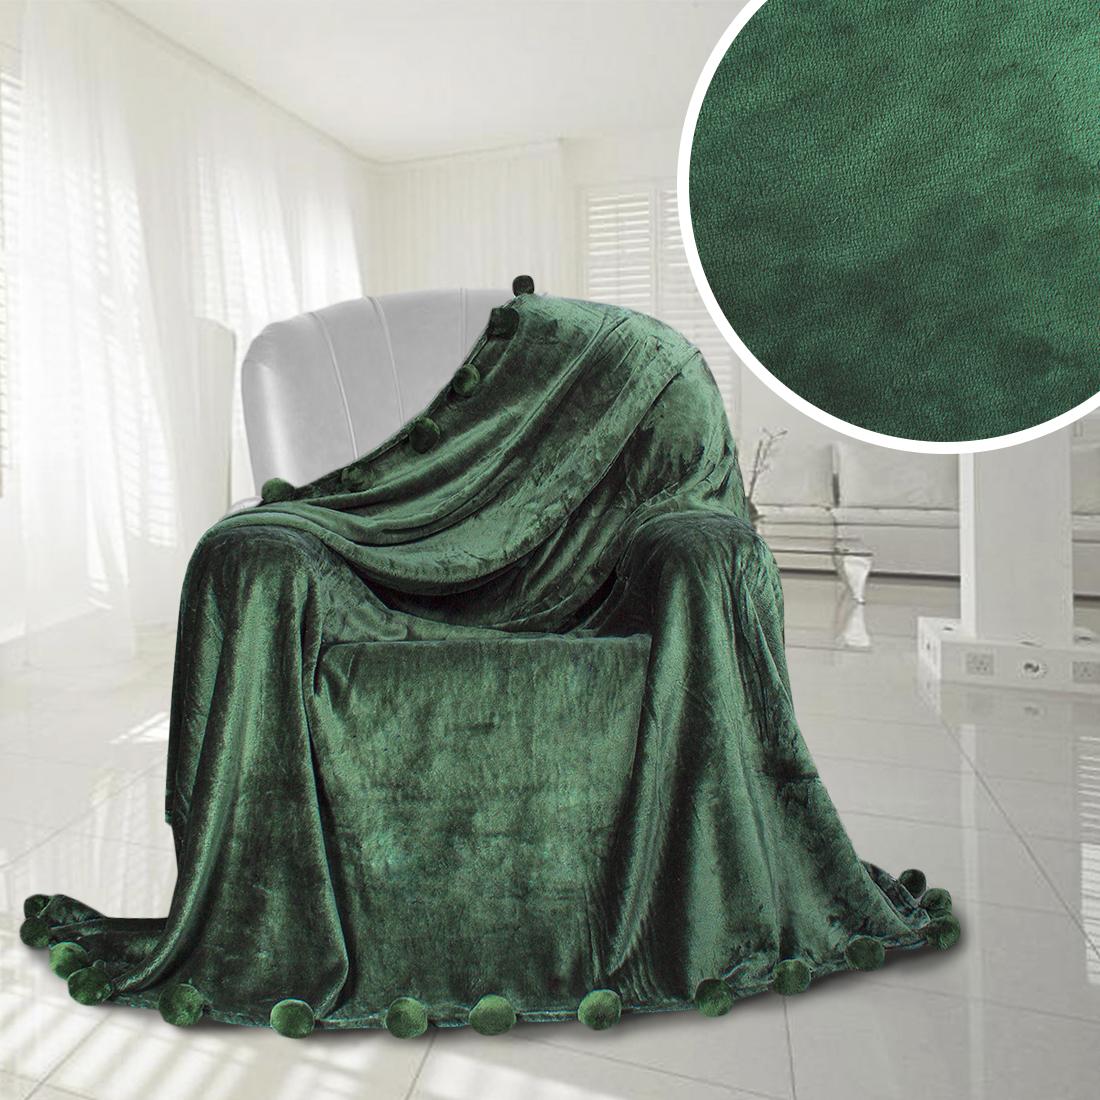 Плед Eleganta Плед Помпон Цвет: Травяной (210х220 см) плед eleganta плед помпон цвет фиолетовый 210х220 см